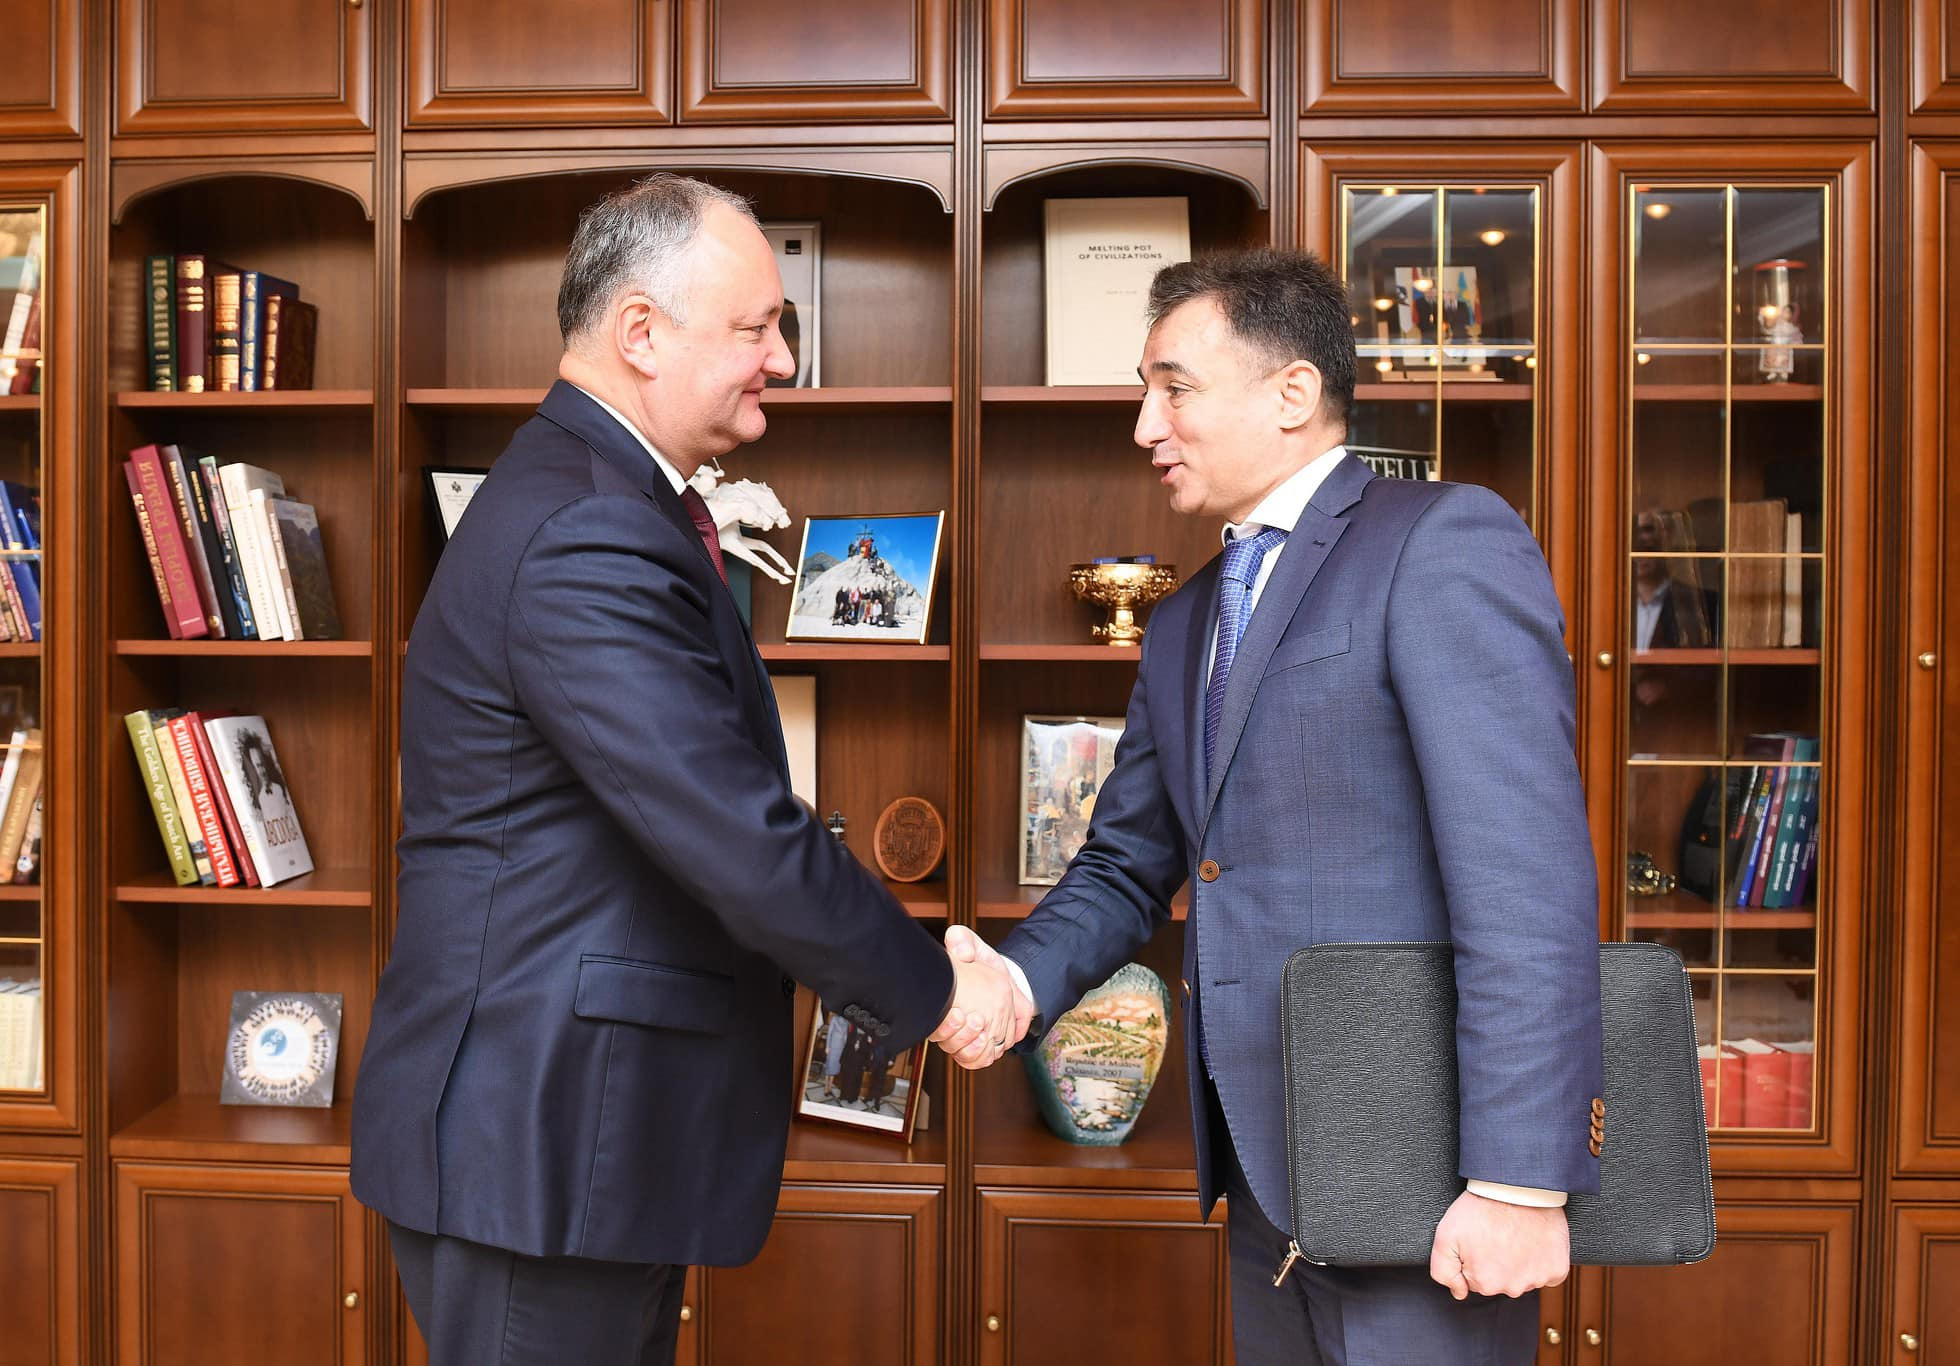 Додон провел встречу с послом Азербайджана в Молдове (ФОТО, ВИДЕО)